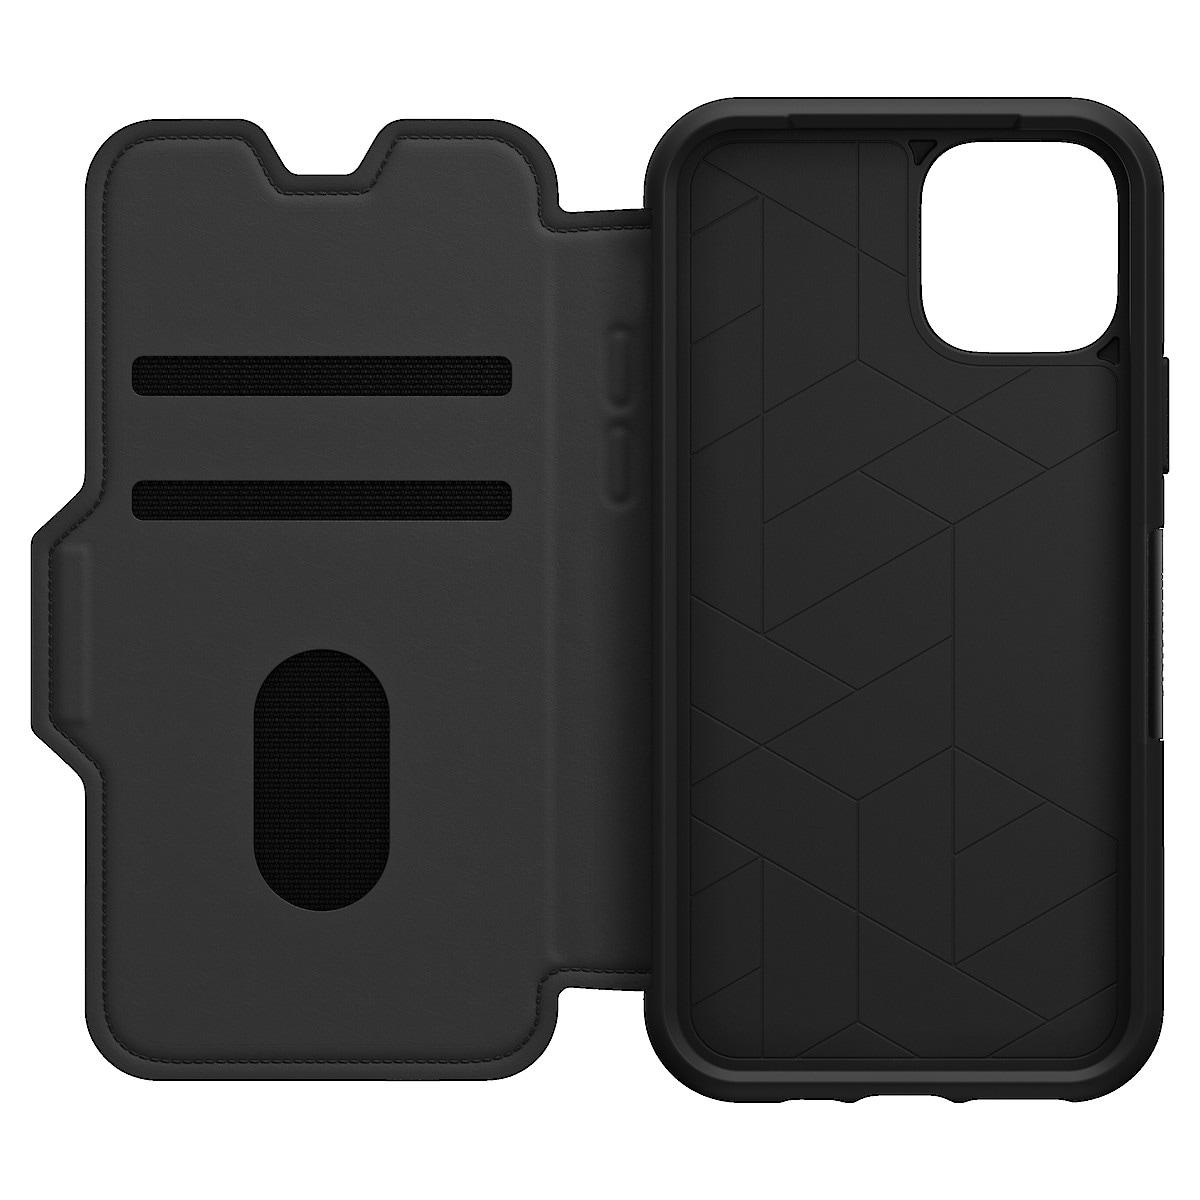 Otterbox Strada för iPhone 11 Pro, Mobilfodral